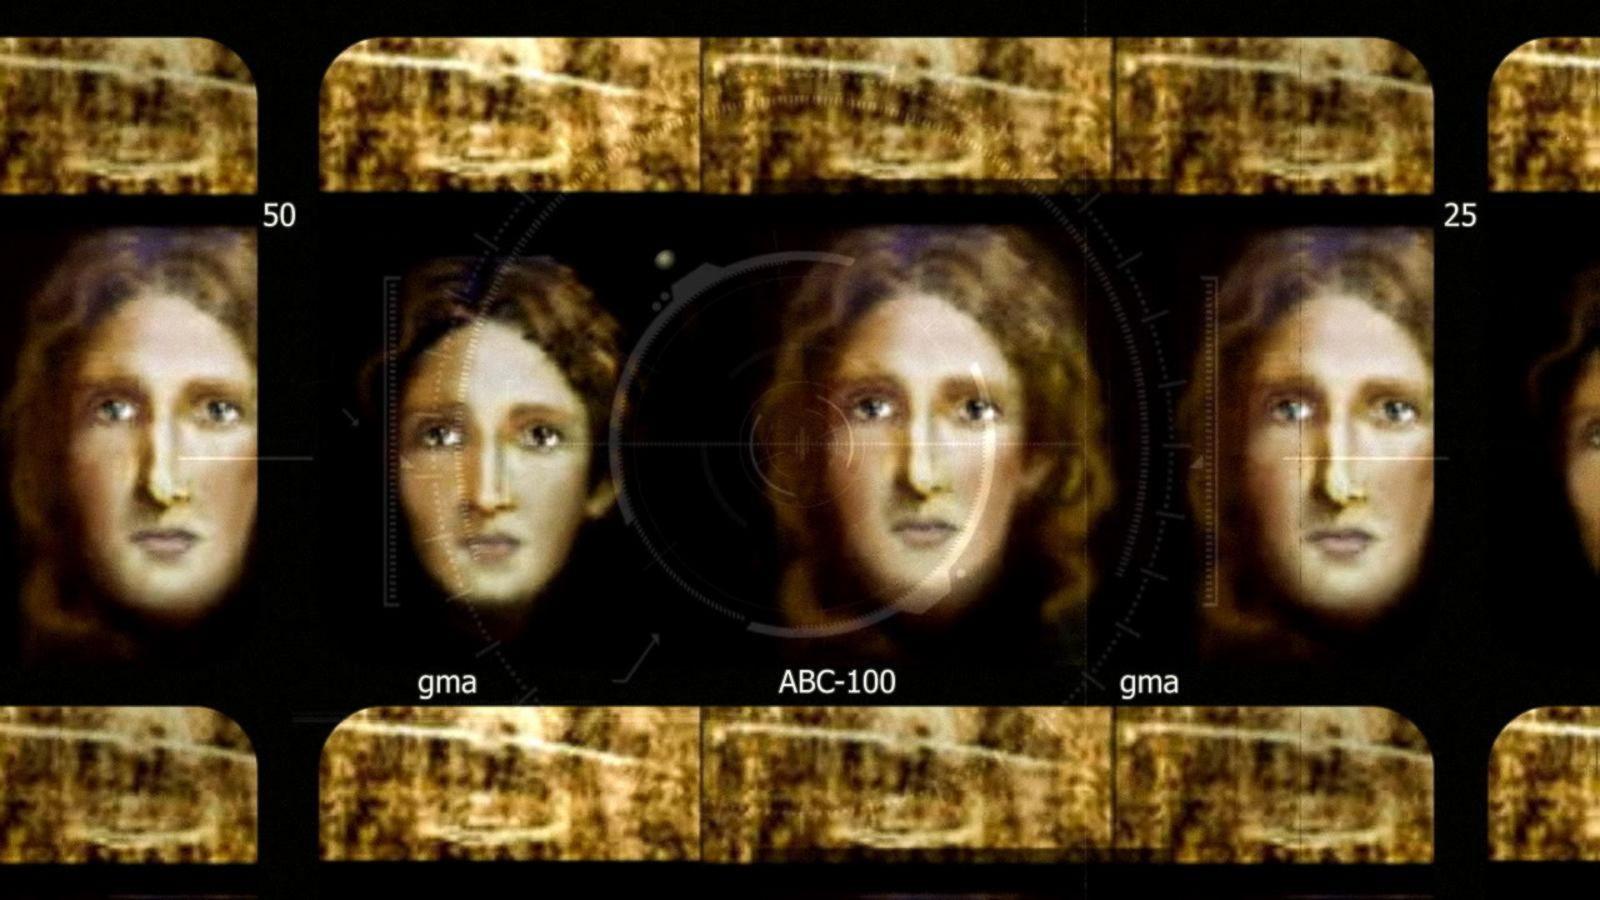 Police Create Image of Jesus as a Child Using Shroud of Turin